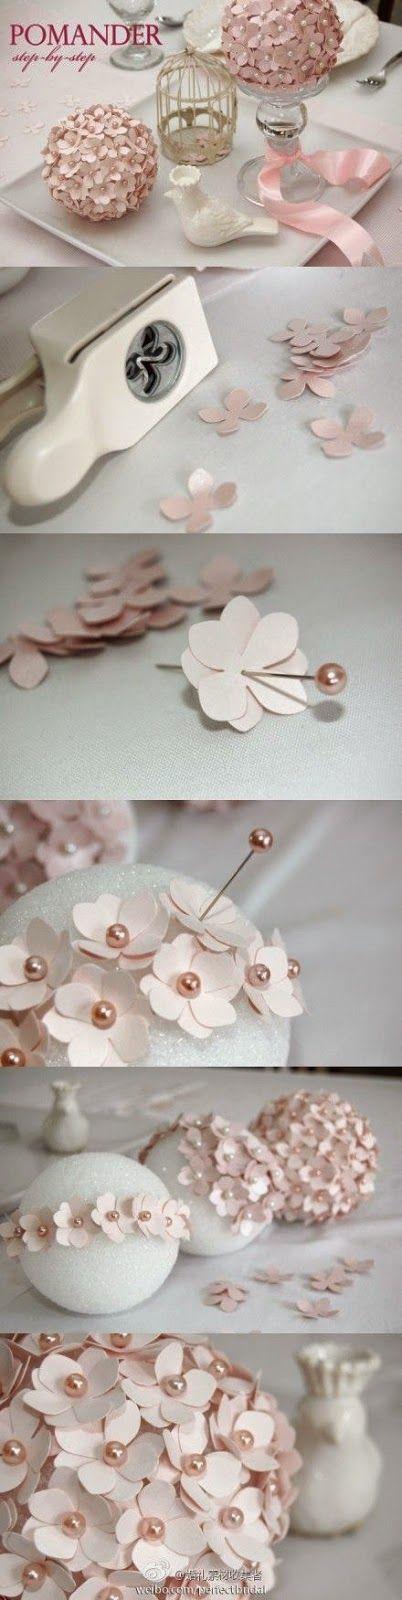 flores de papel para decoracion de bodas